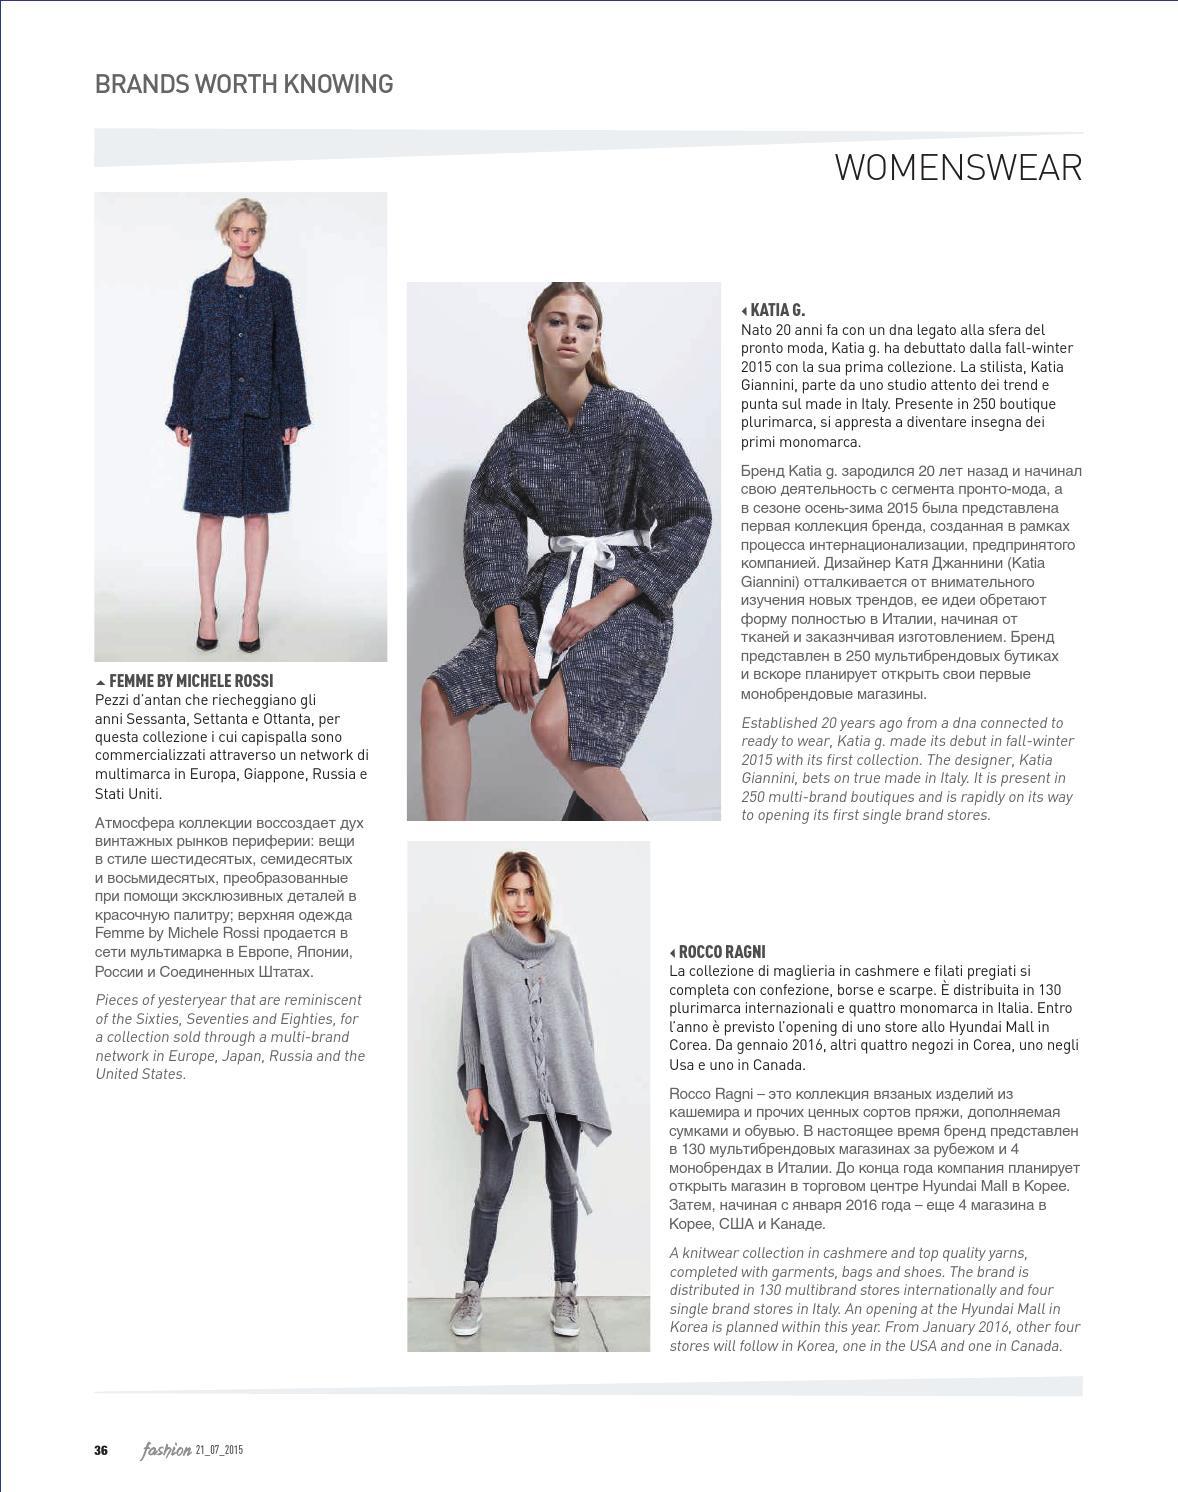 a6e28624233 Fashion 12 2015 by Fashionmagazine - issuu